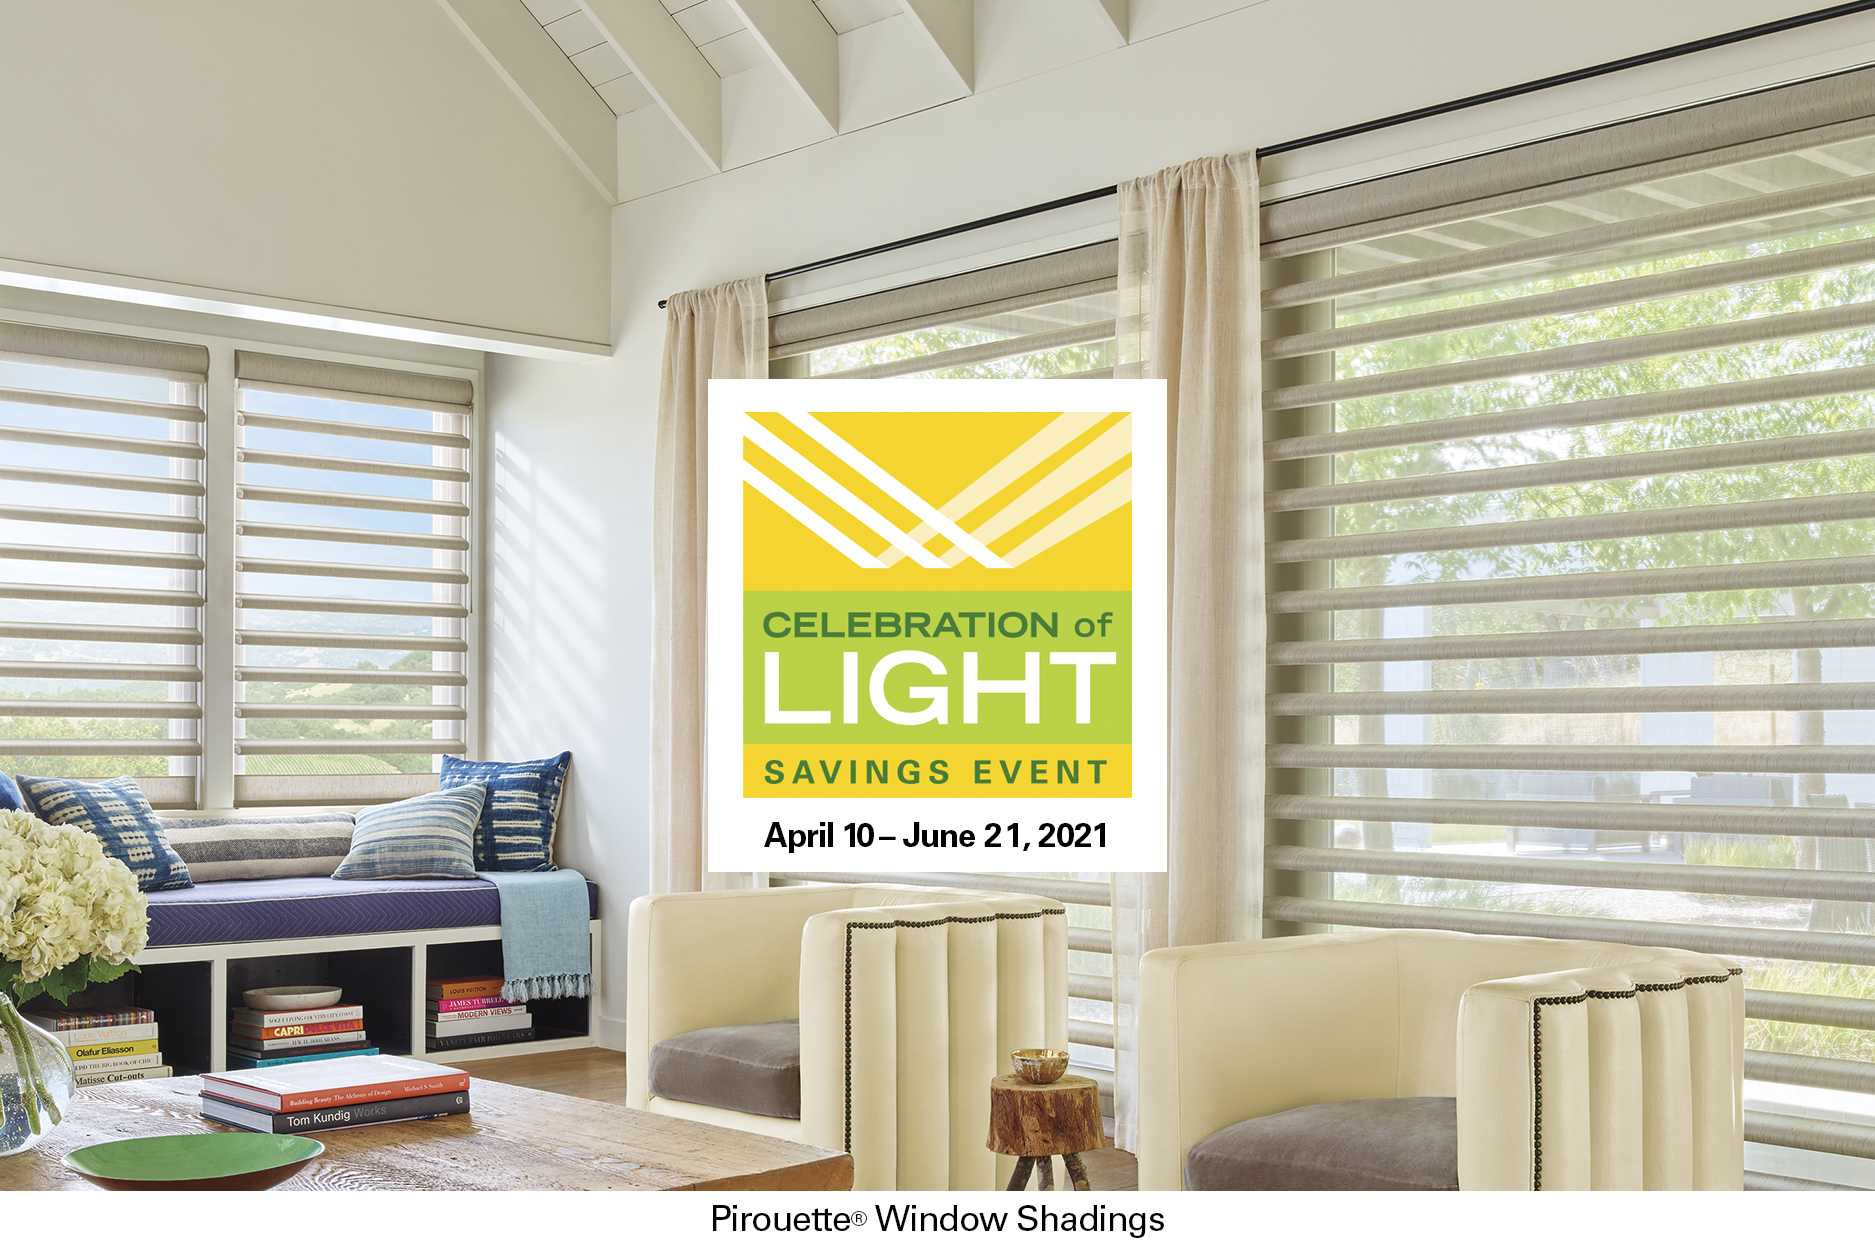 Celebration of Light Savings Event